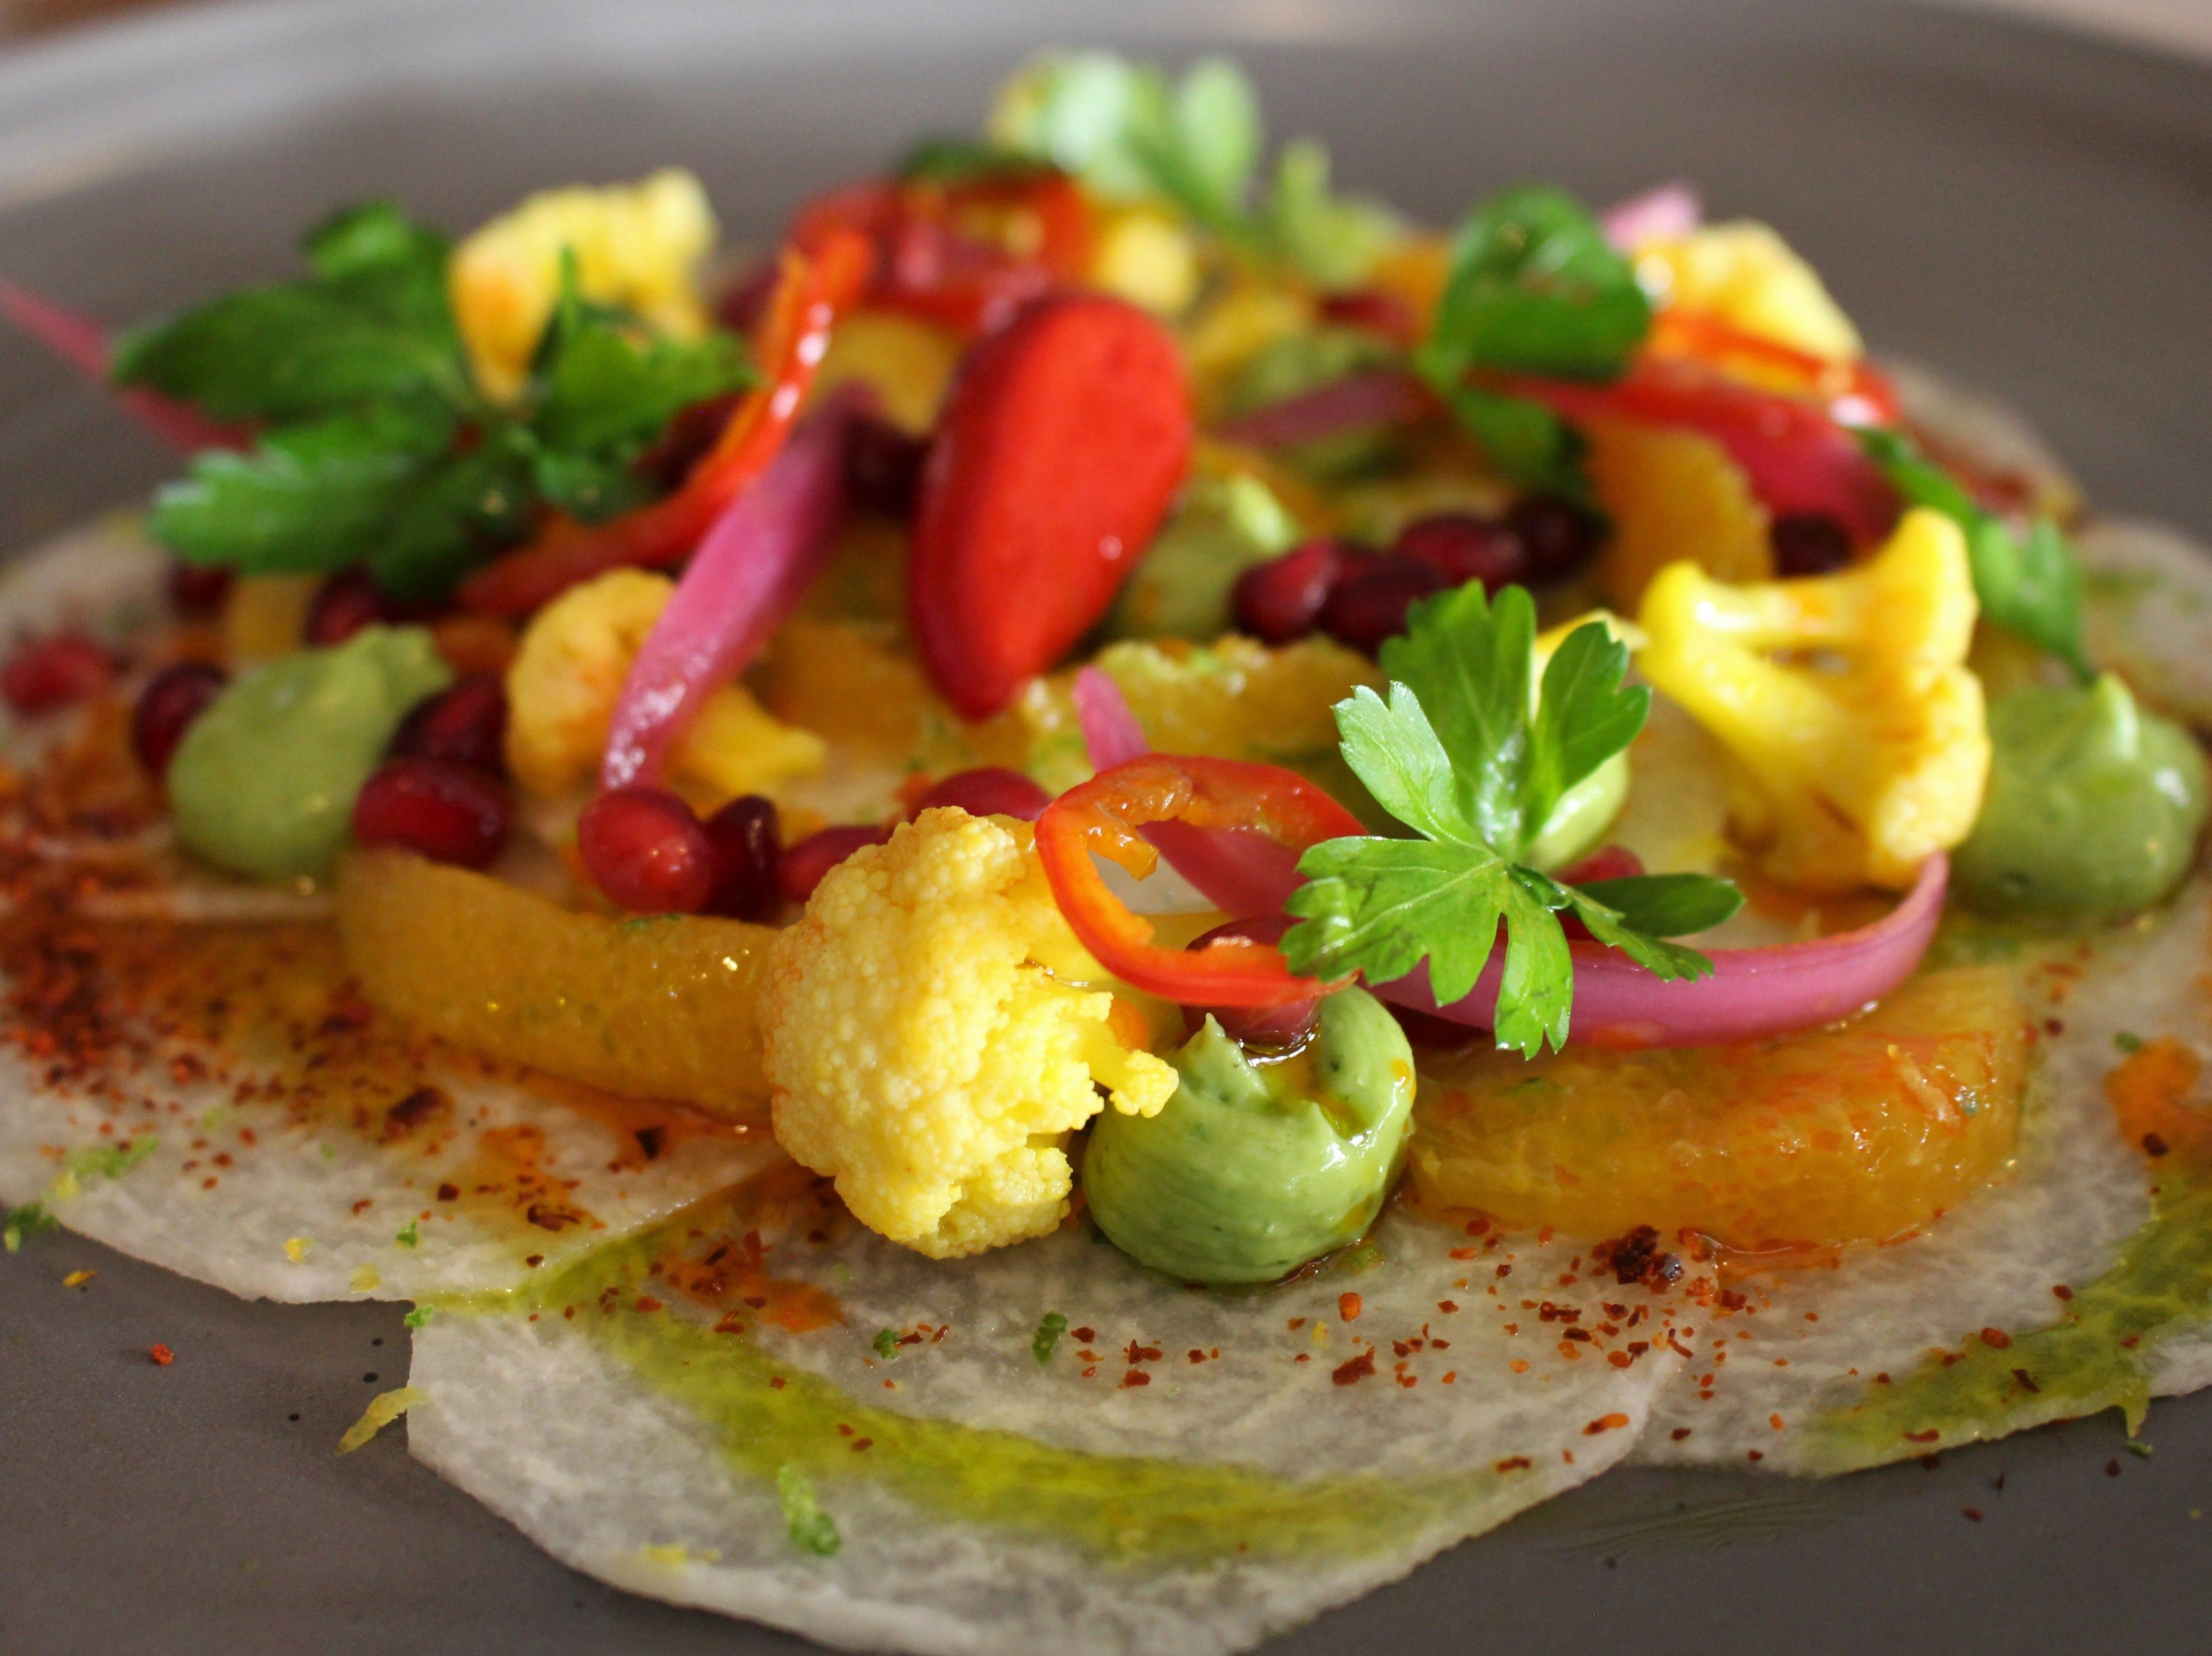 Jicama Crudo with avocado puree and orange segments from Casa Terra, a vegan fine dining restaurant in Glendale.